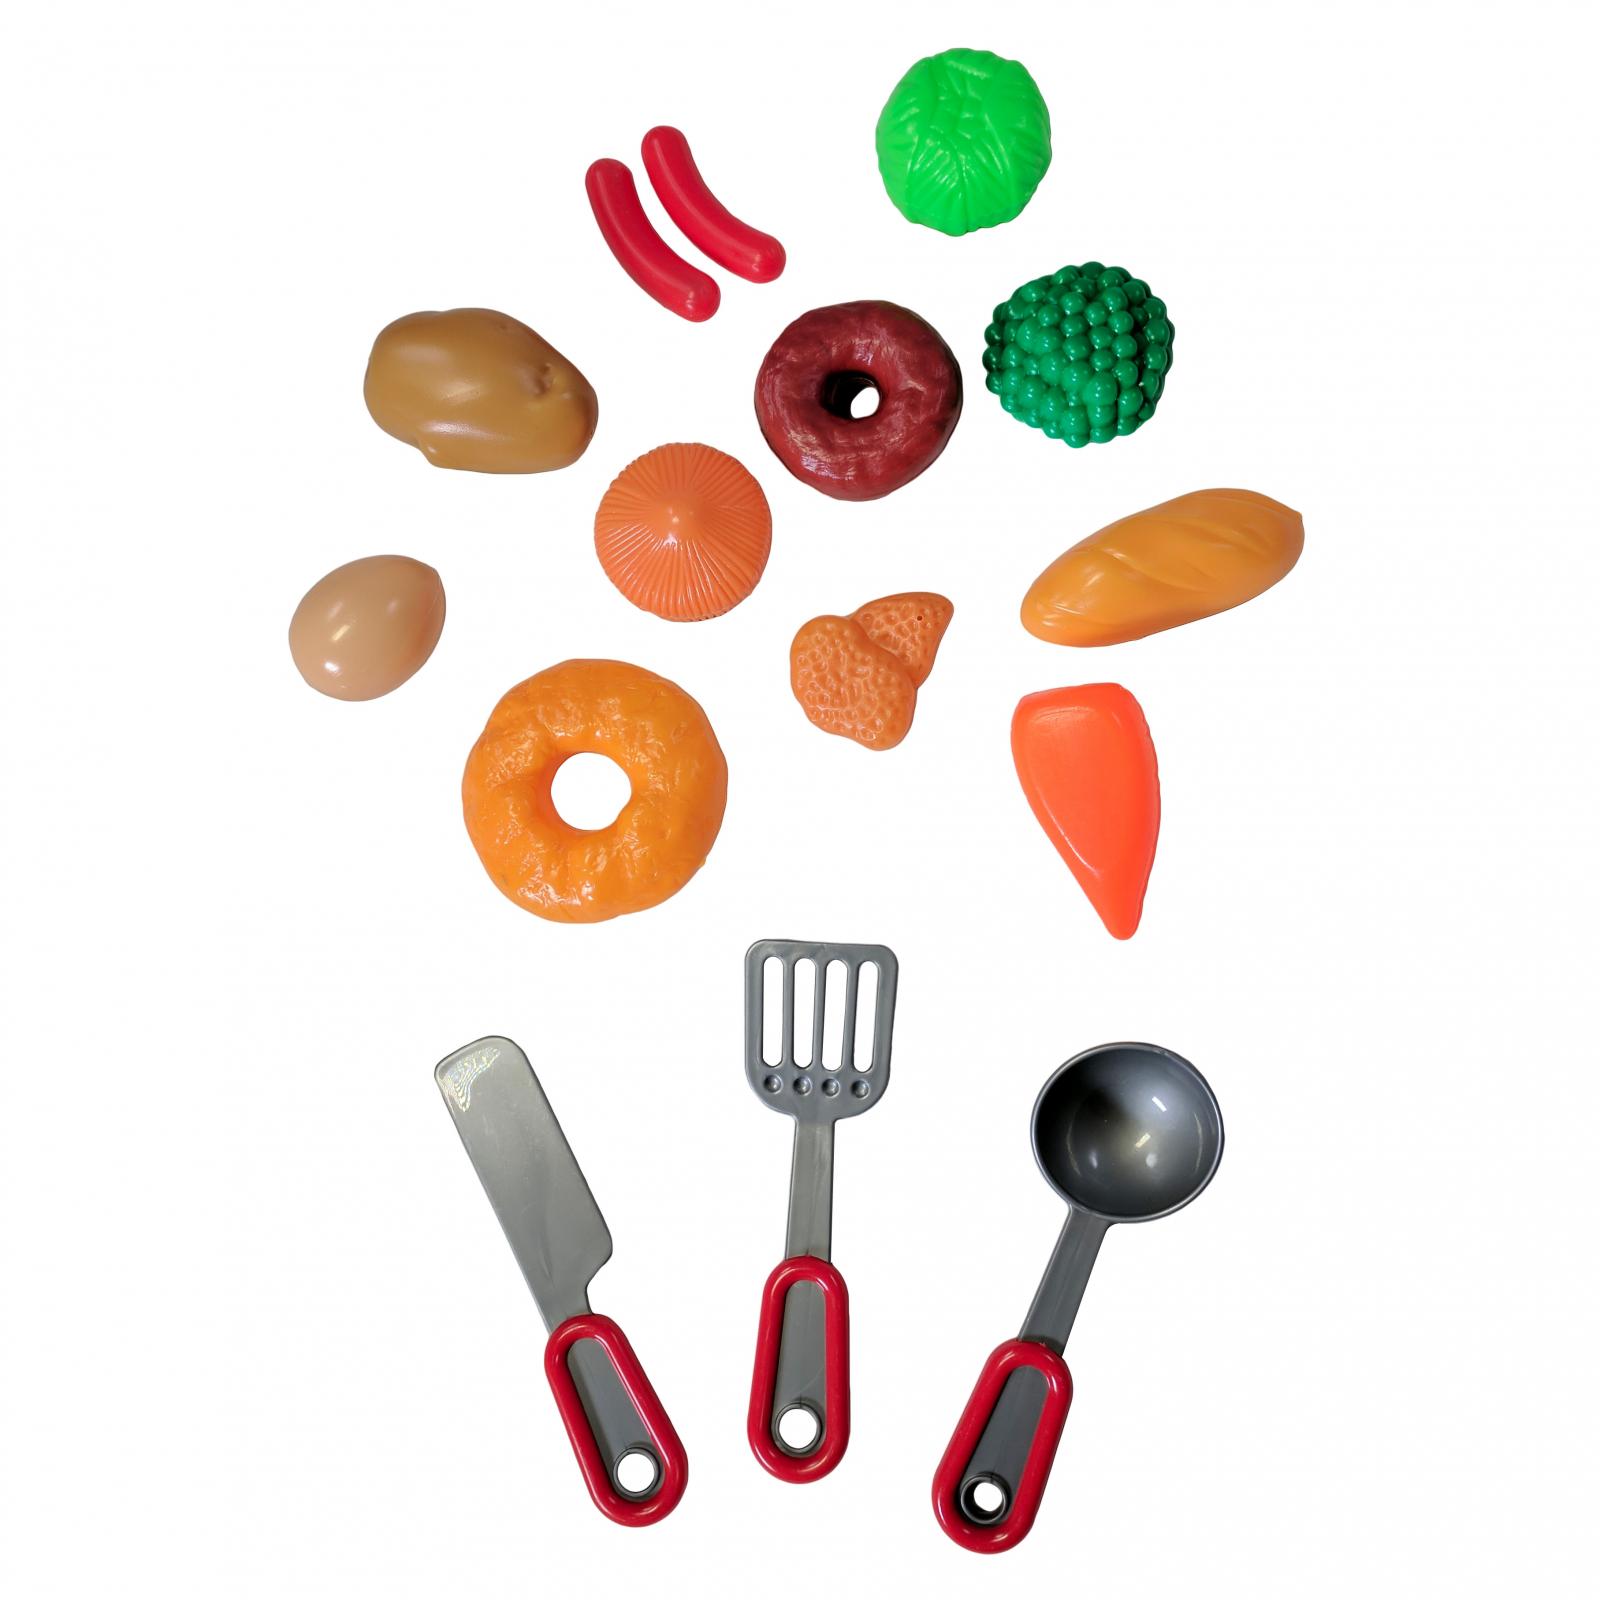 Kitchen Pan Play Set Plastic Utensils, Pan, Food Included